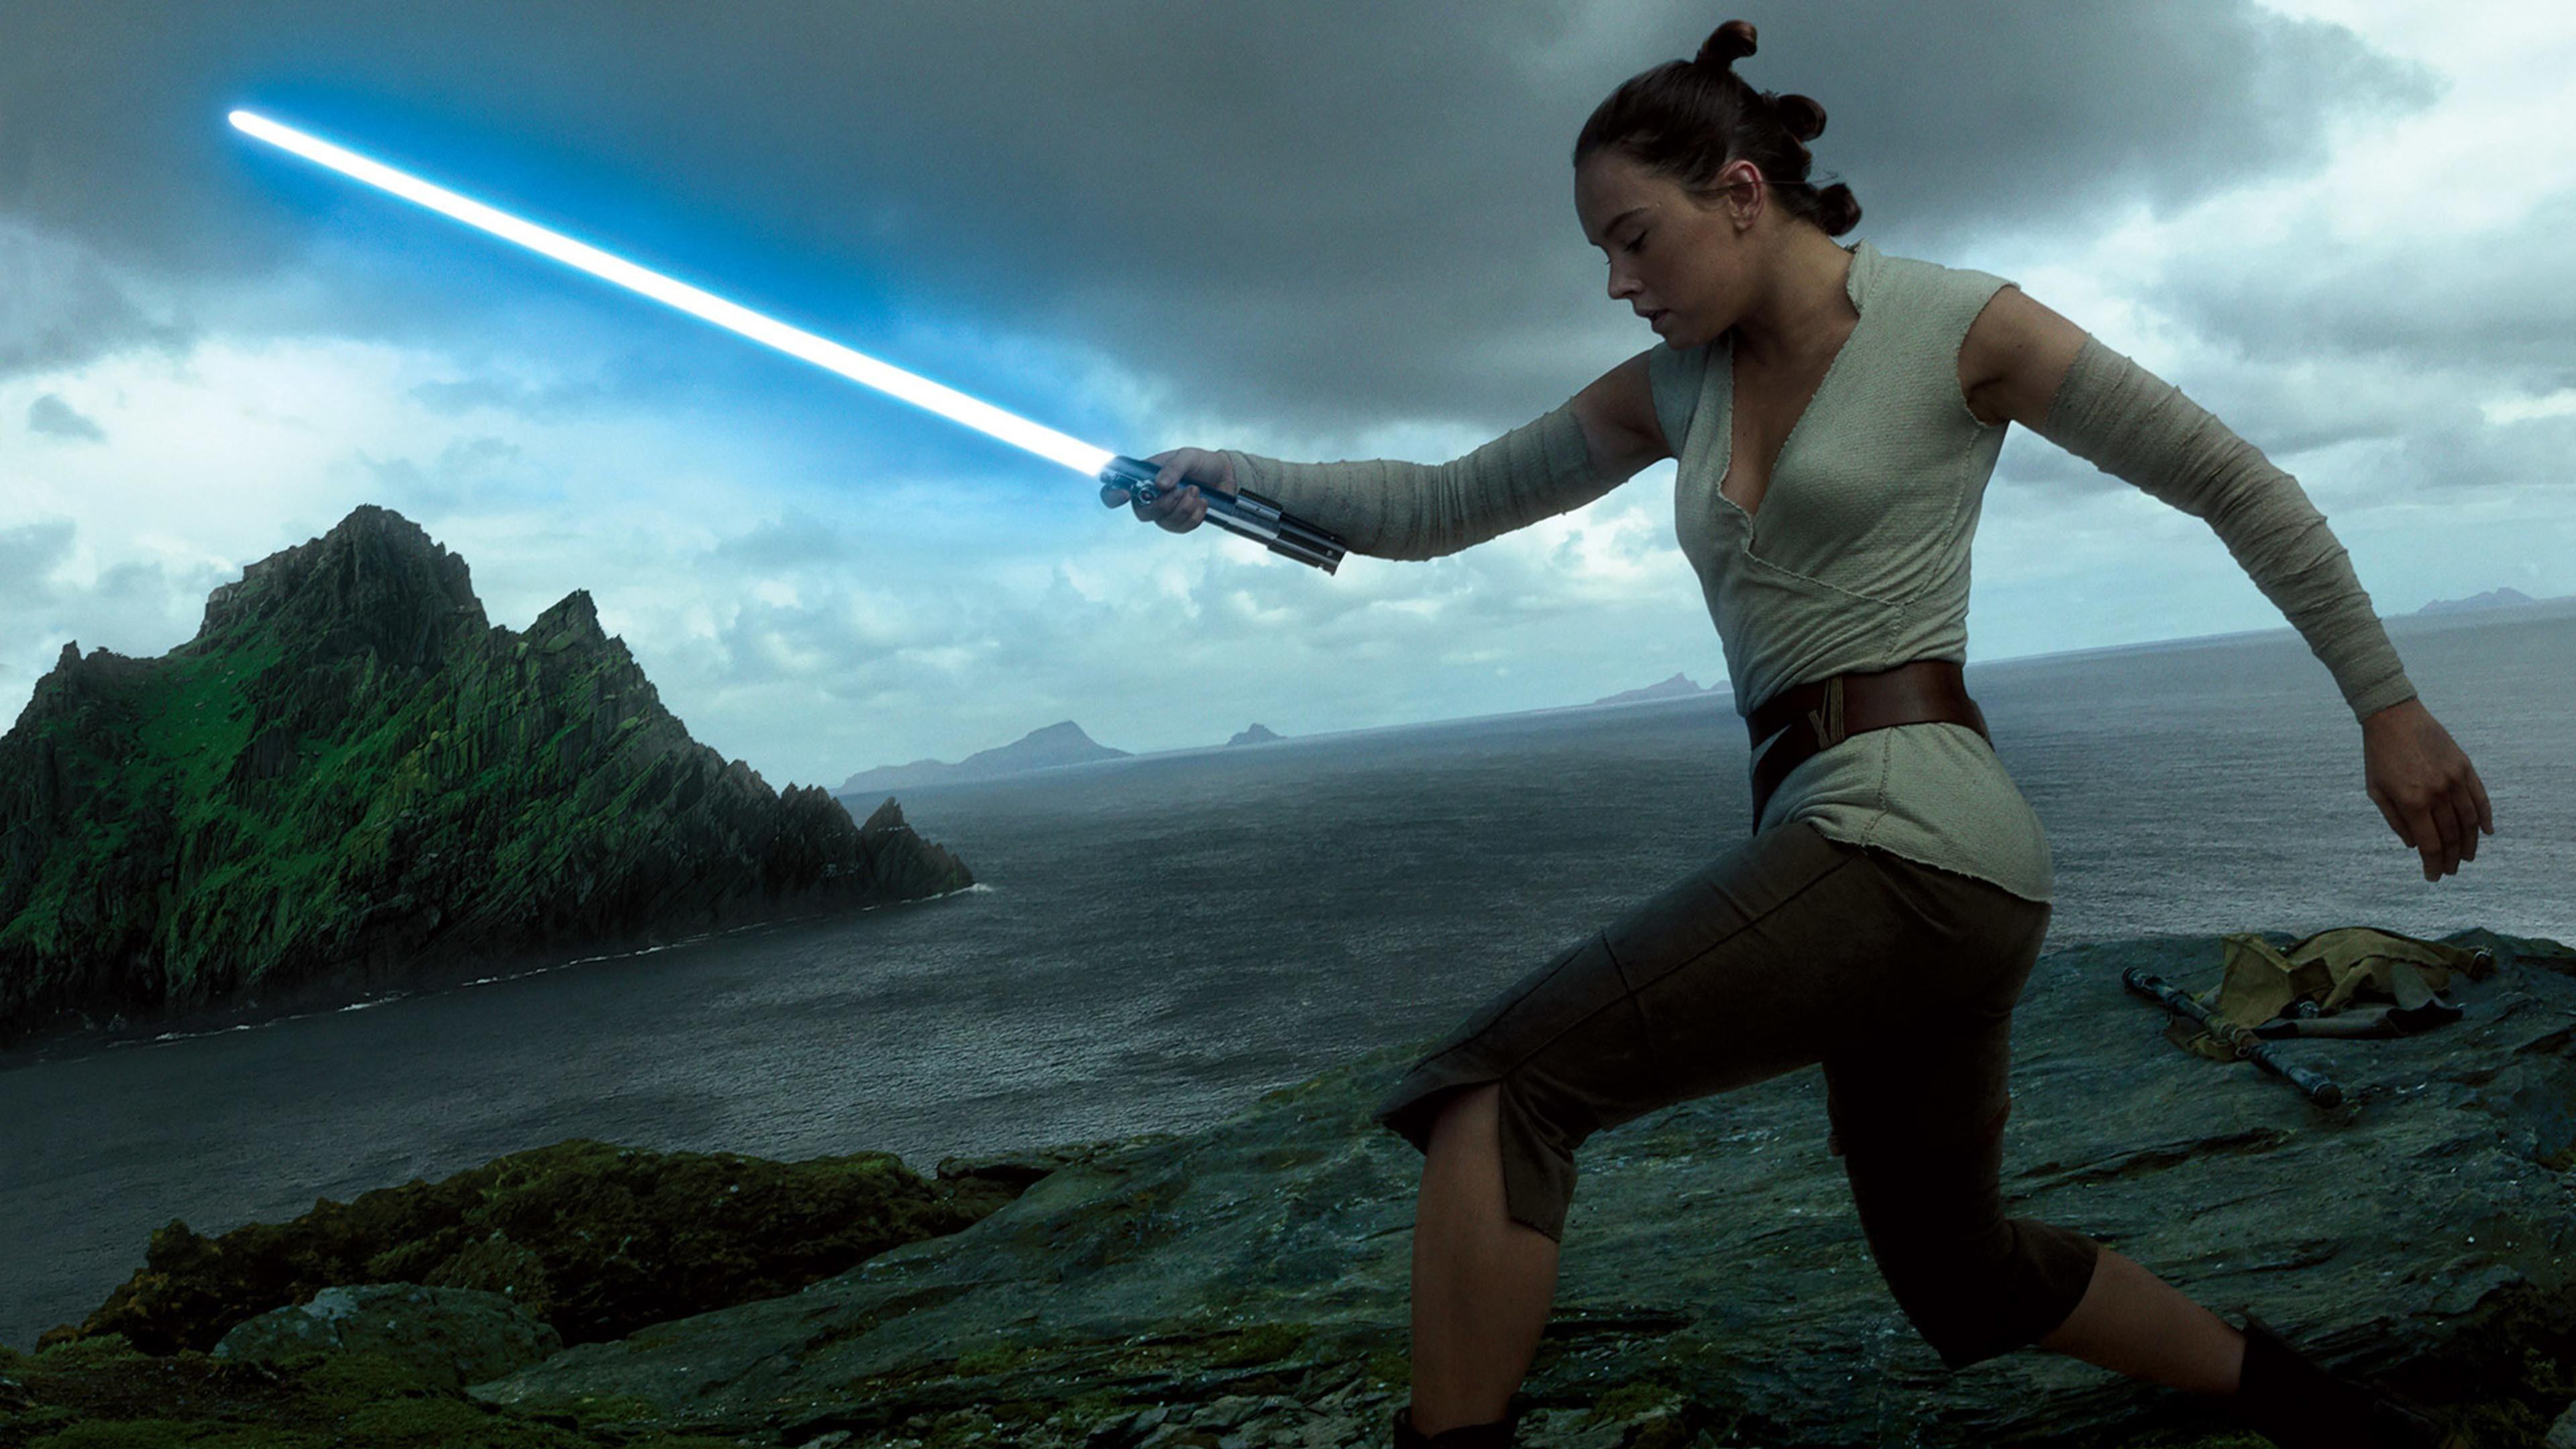 Rey lightsaber training – Star Wars: The Last Jedi wallpaper